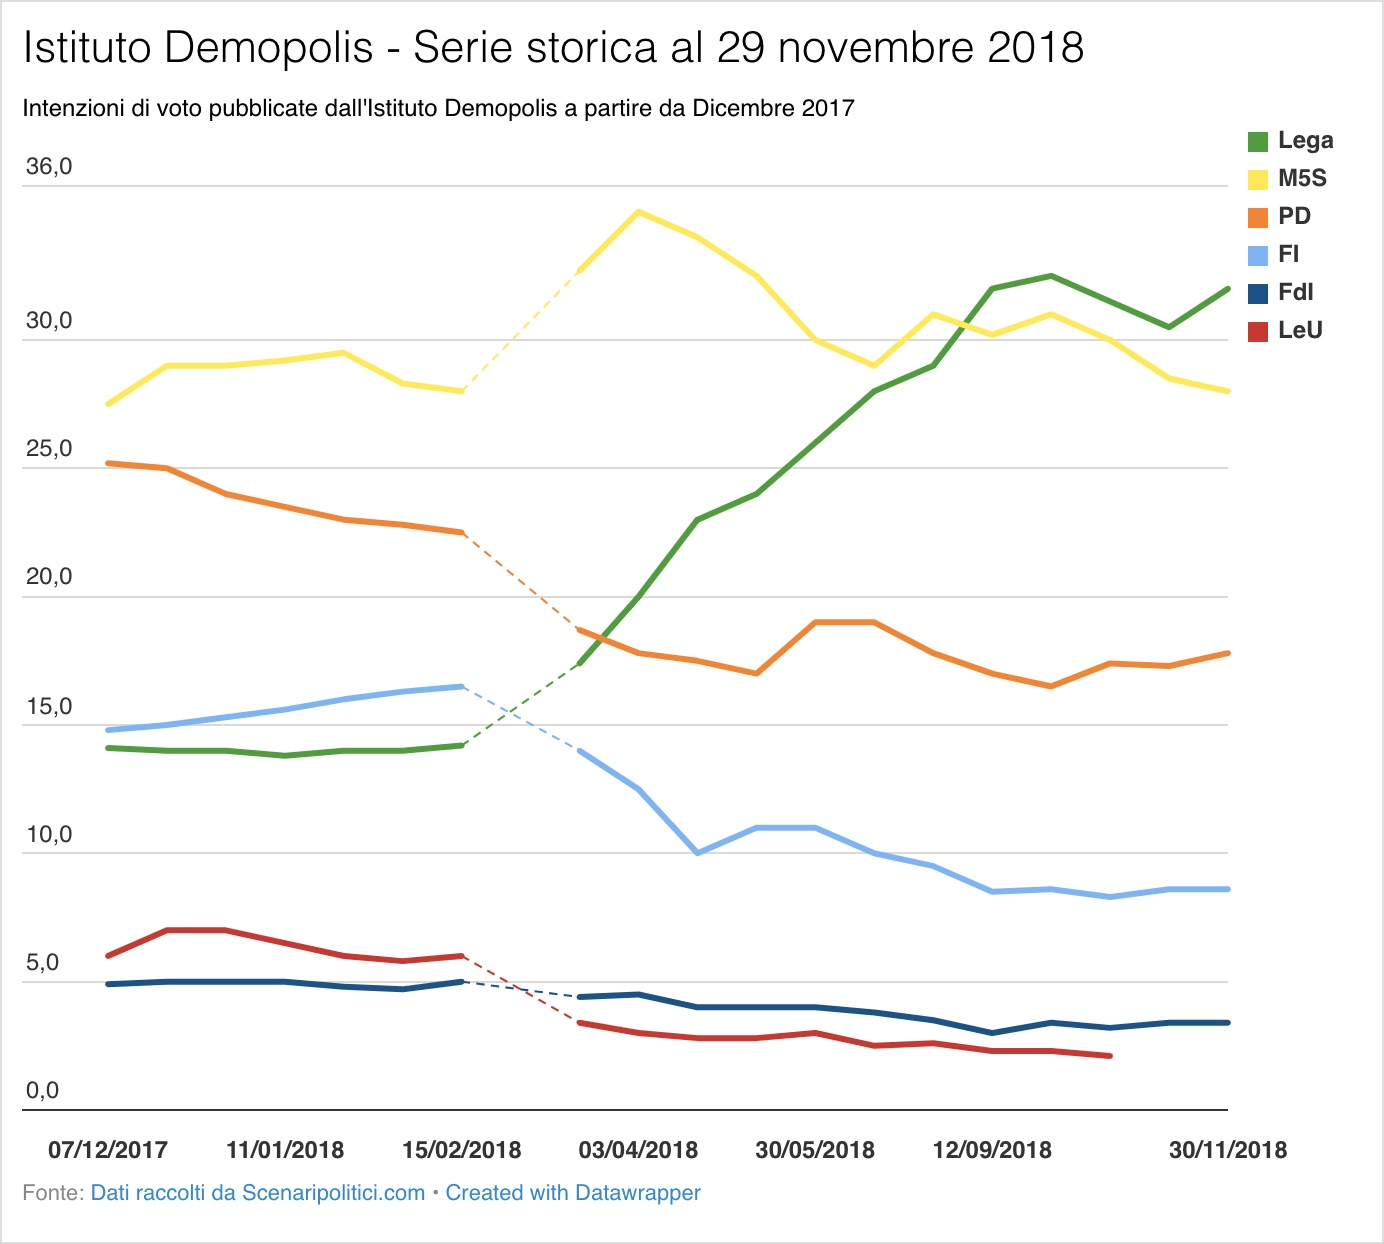 Sondaggio Demopolis (29 novembre 2018)